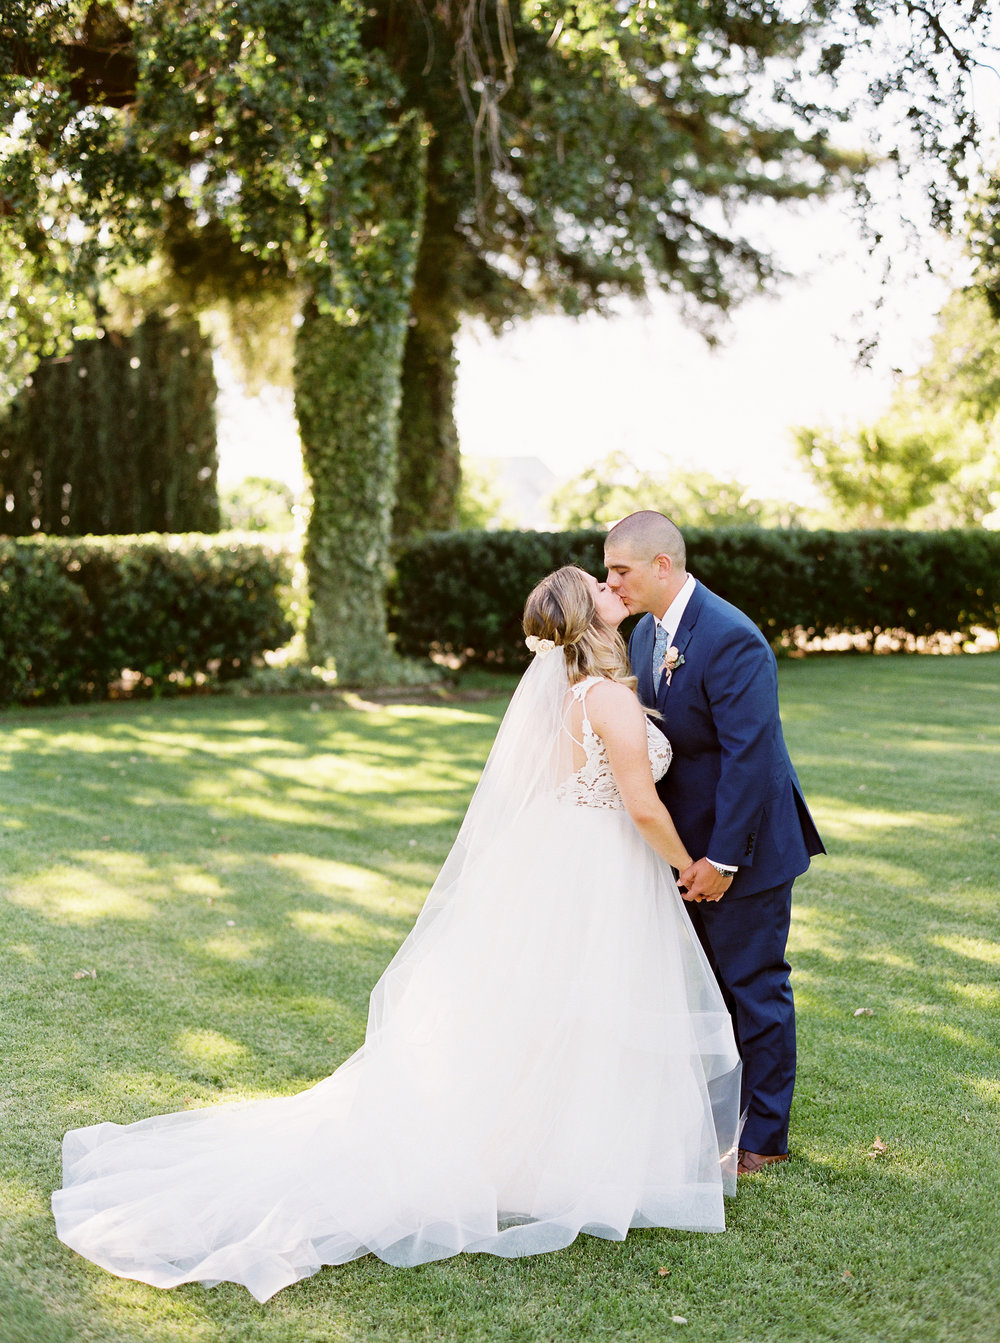 Durst-winery-wedding-in-lodi-calfornia-116.jpg